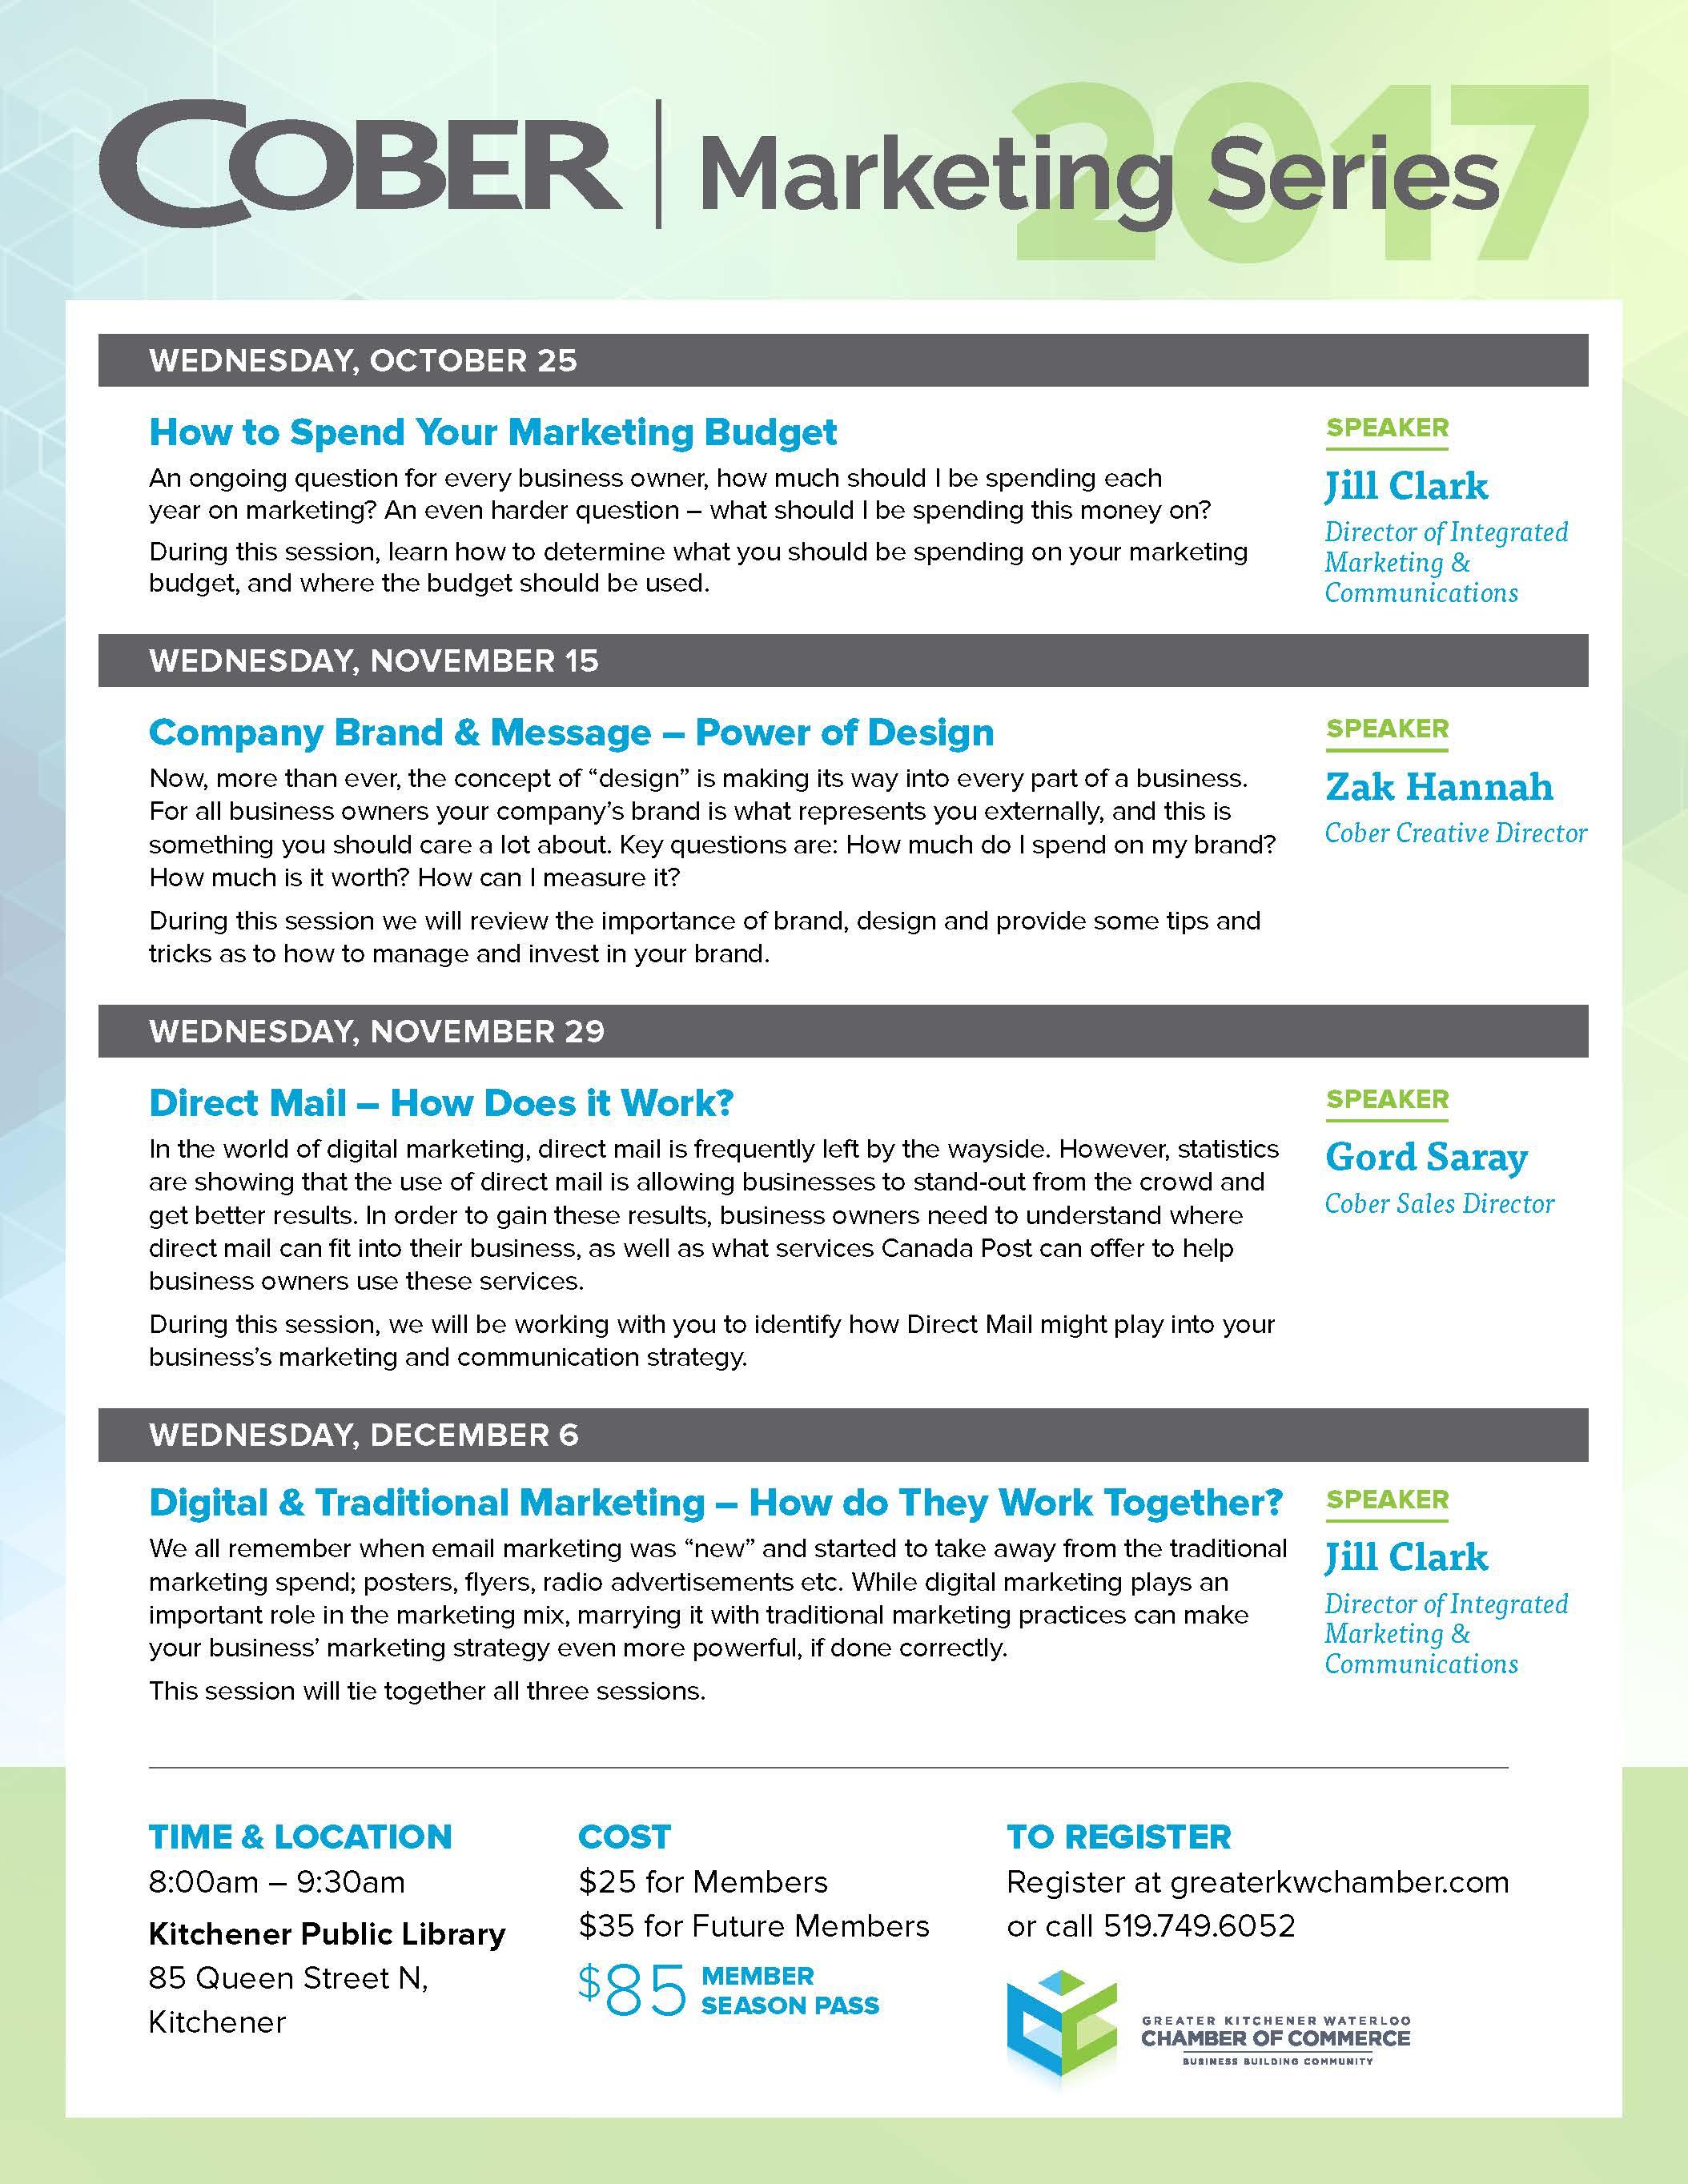 Cober Marketing Series - Chamber of Cmerce KW